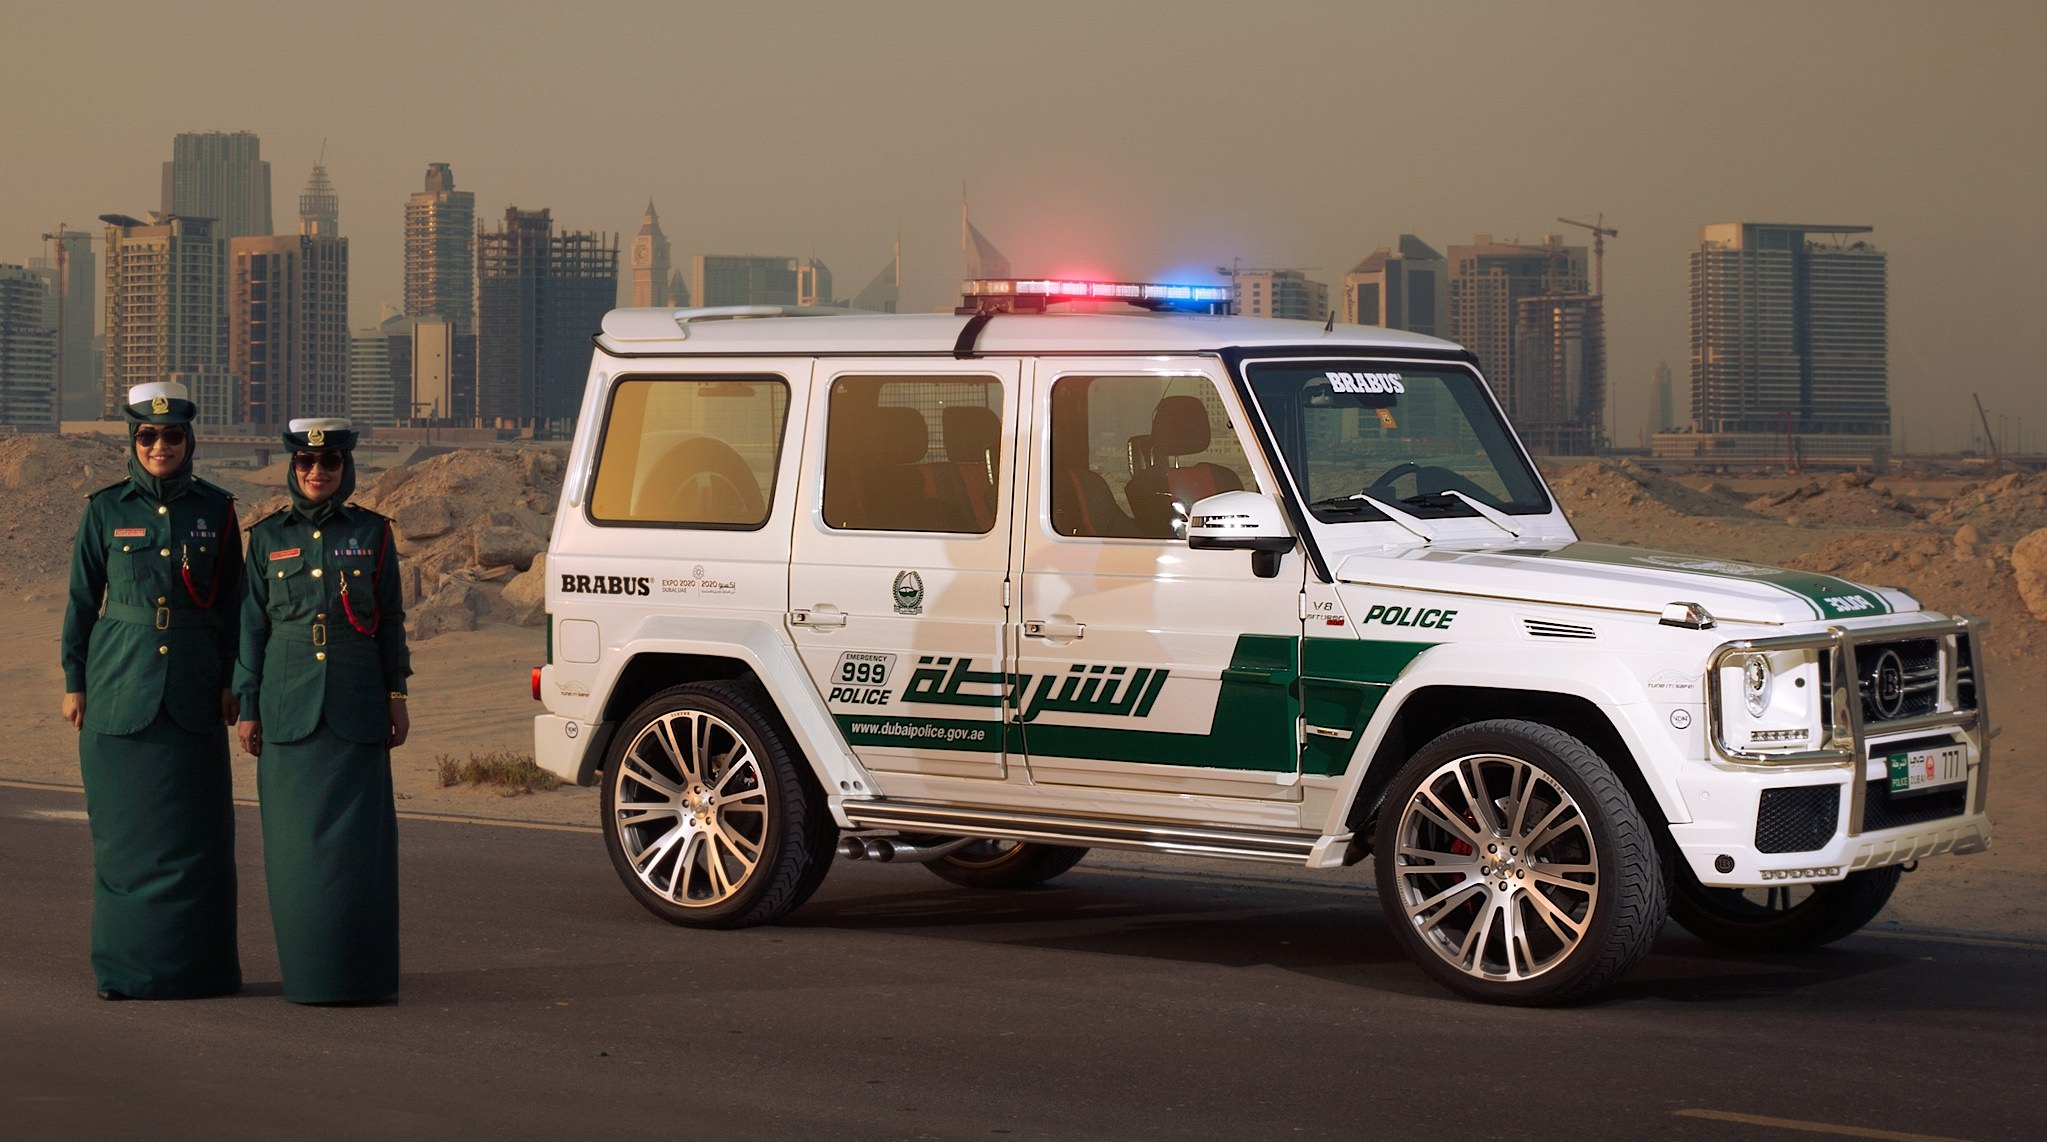 Island Detail And Color | Dubai Police 9